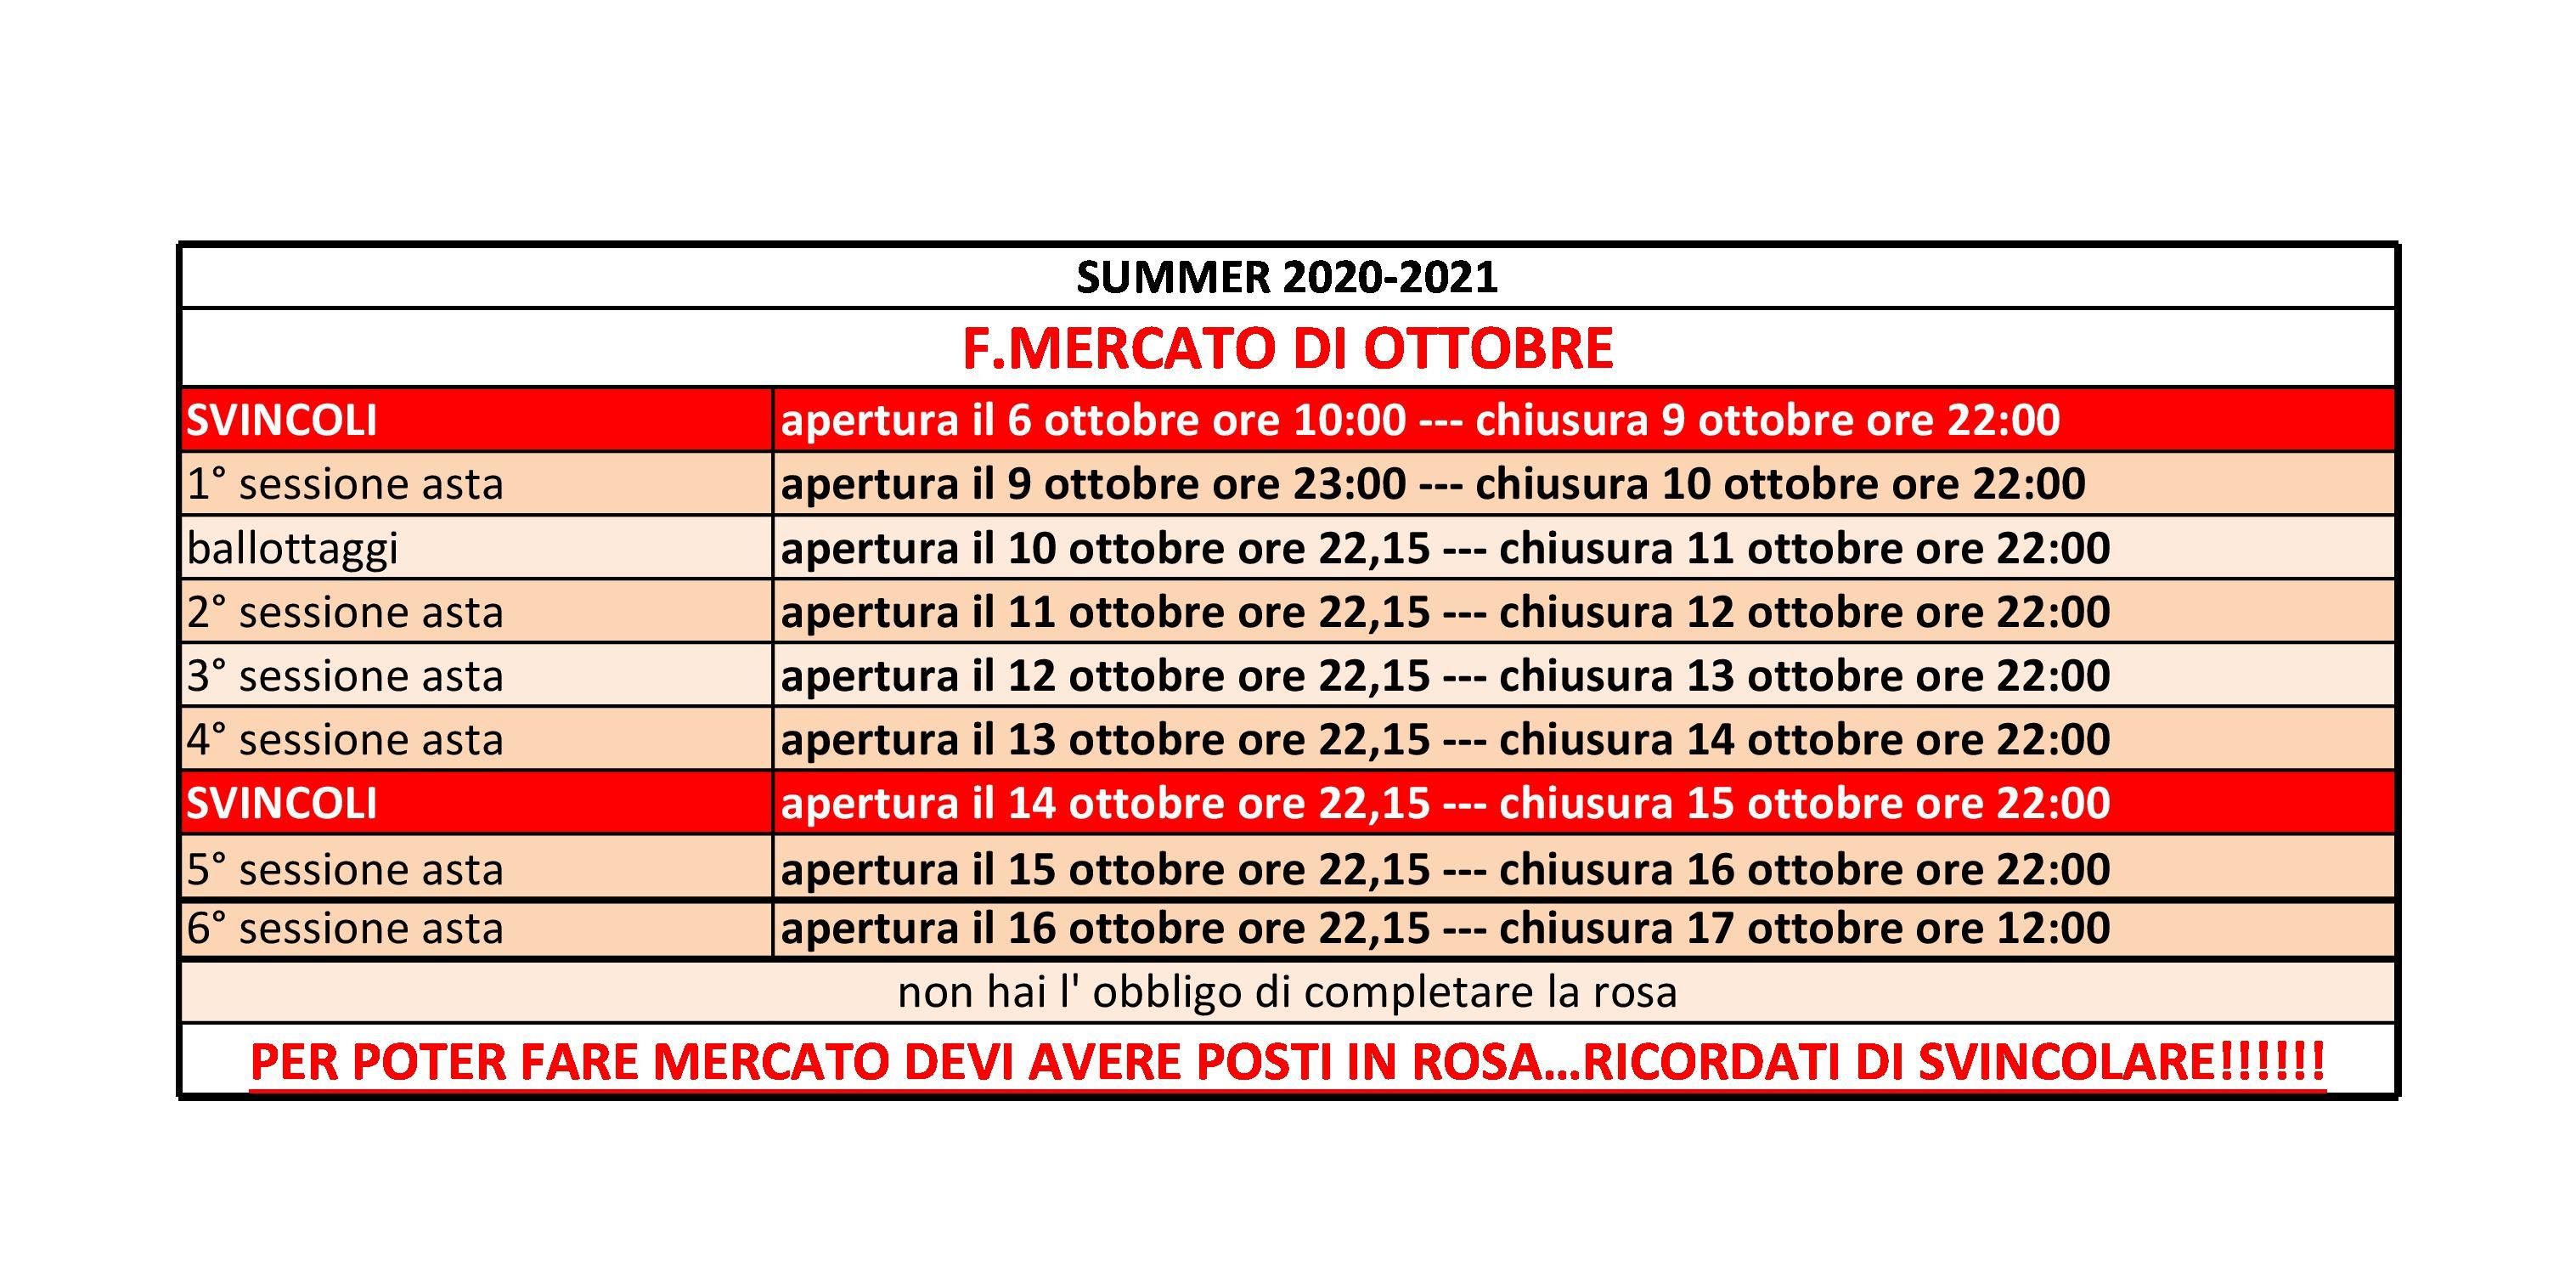 FANTAMERCATO-OTTOBRE-luxury-2020-21-1-1